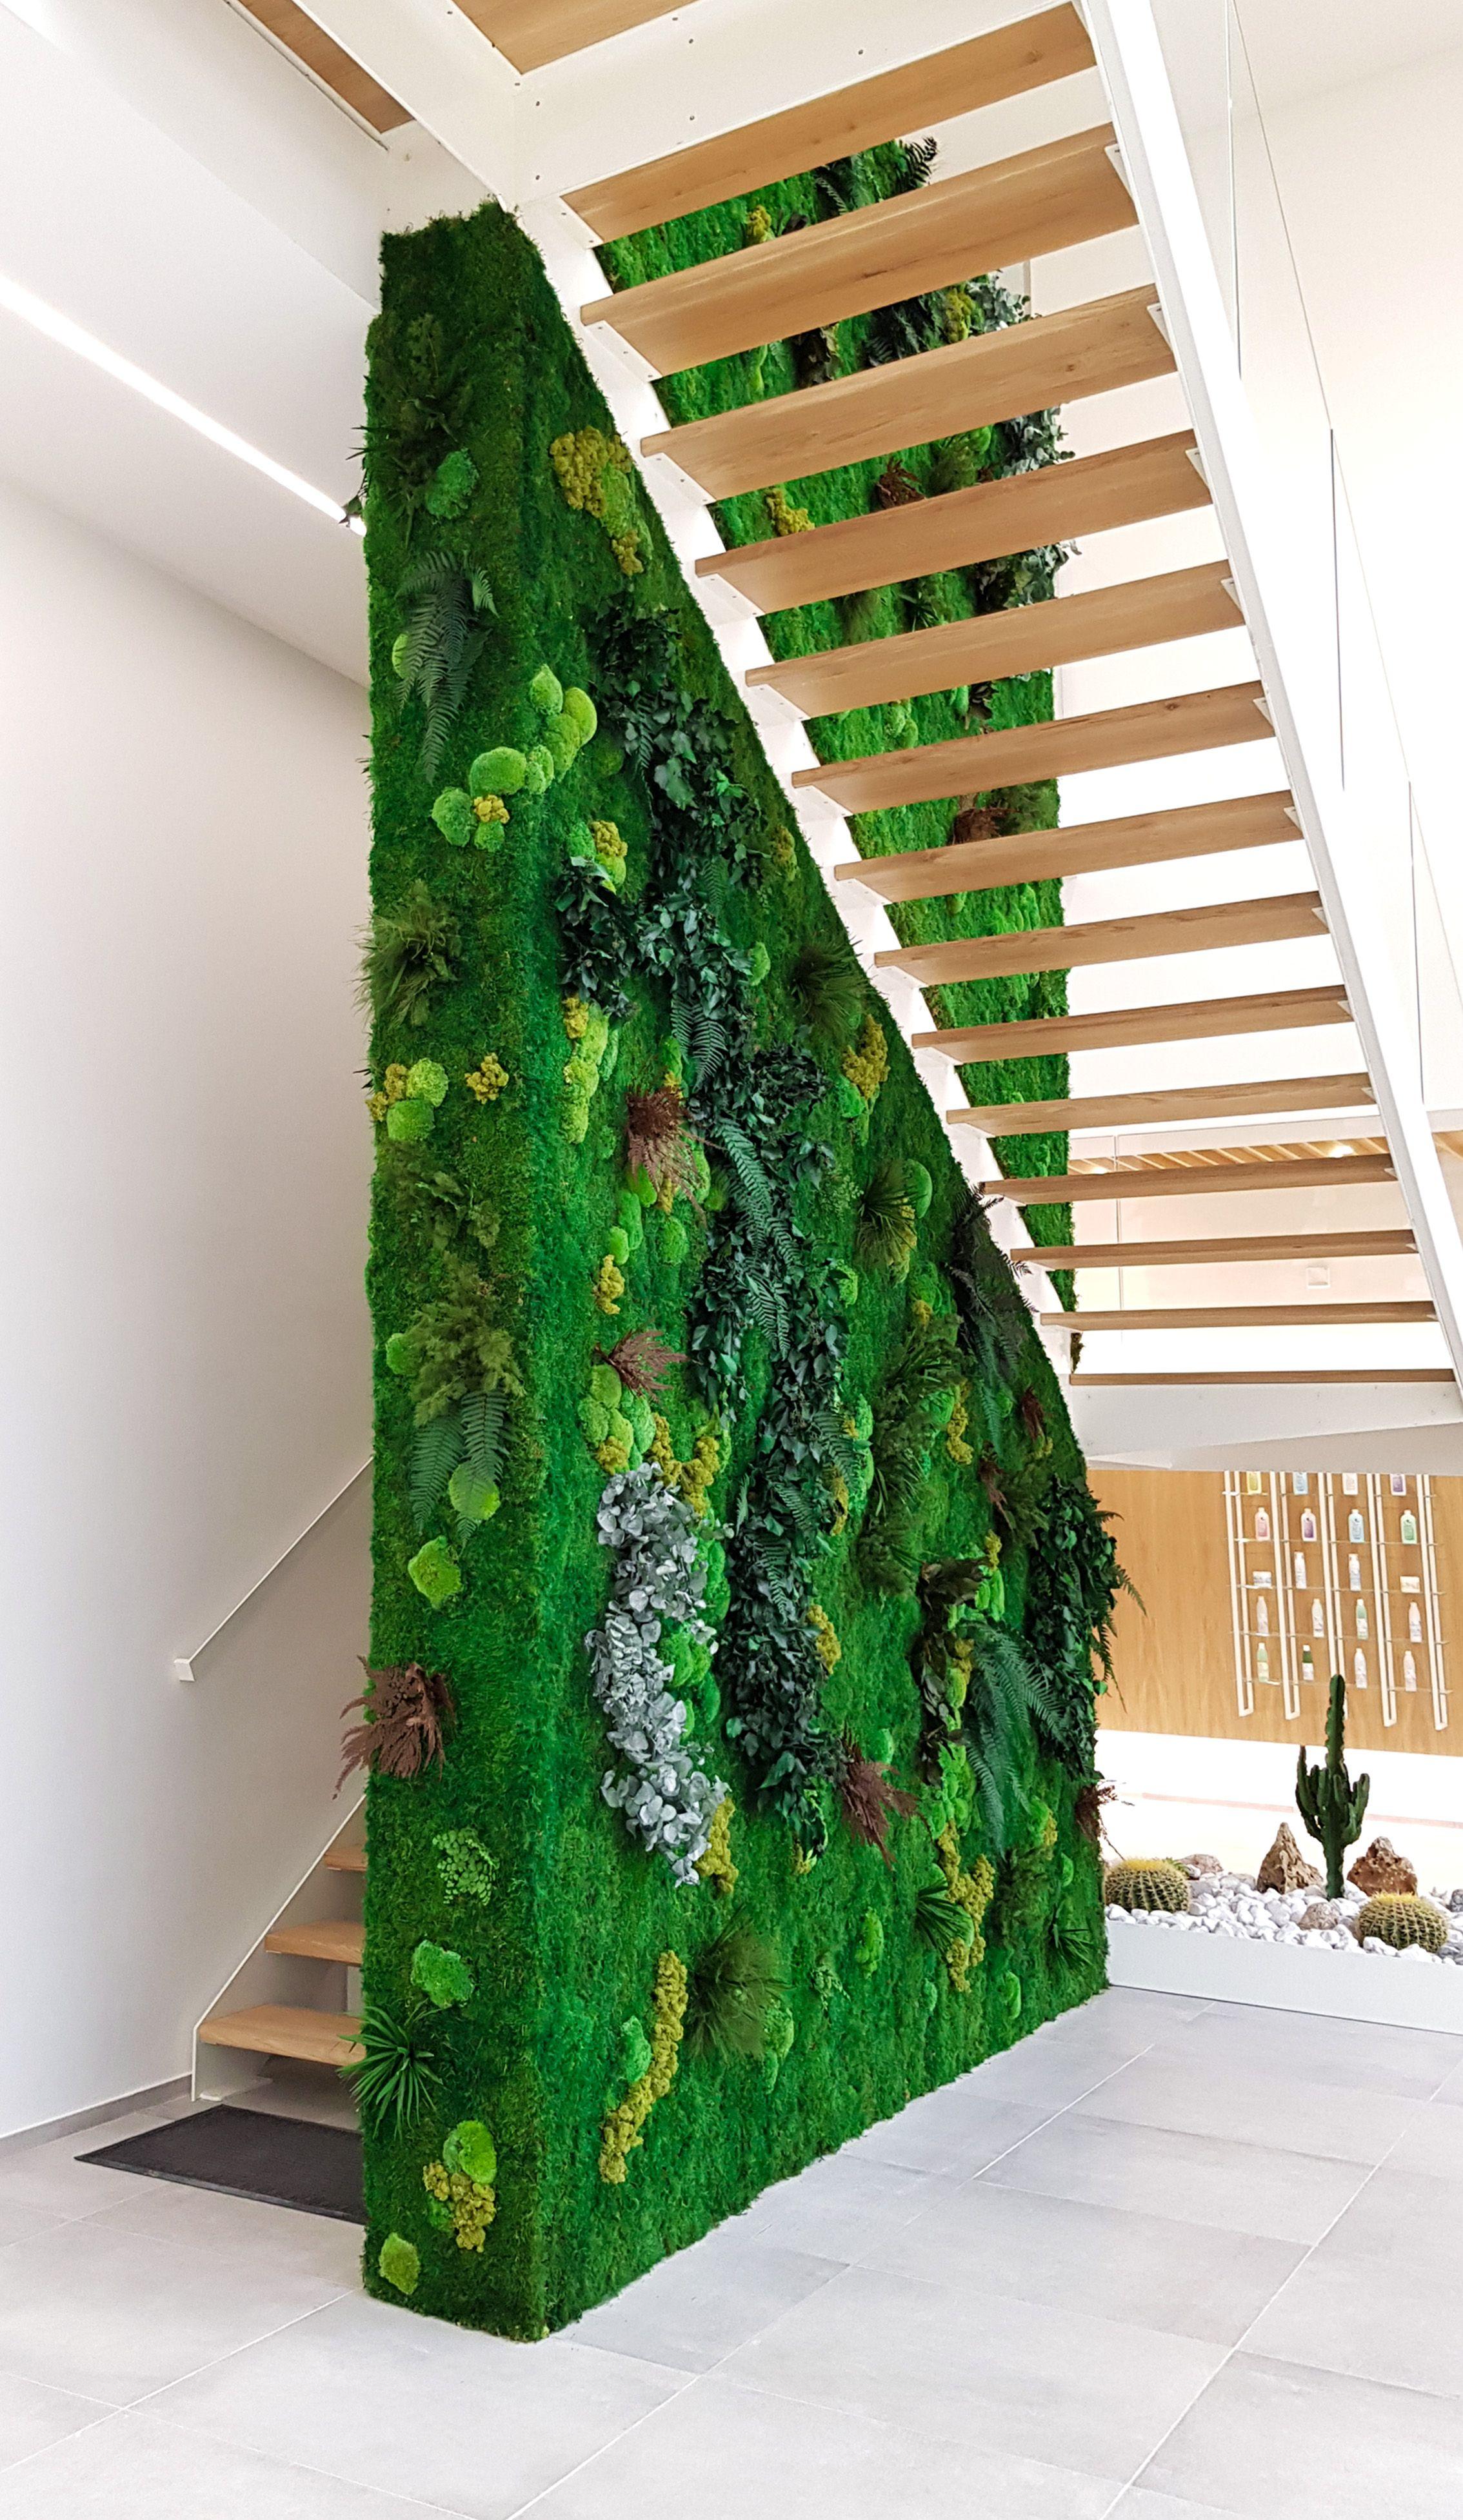 Pareti Verdi Verticali Costi moss design in 2020 | zielona ściana, wnętrza, ogród